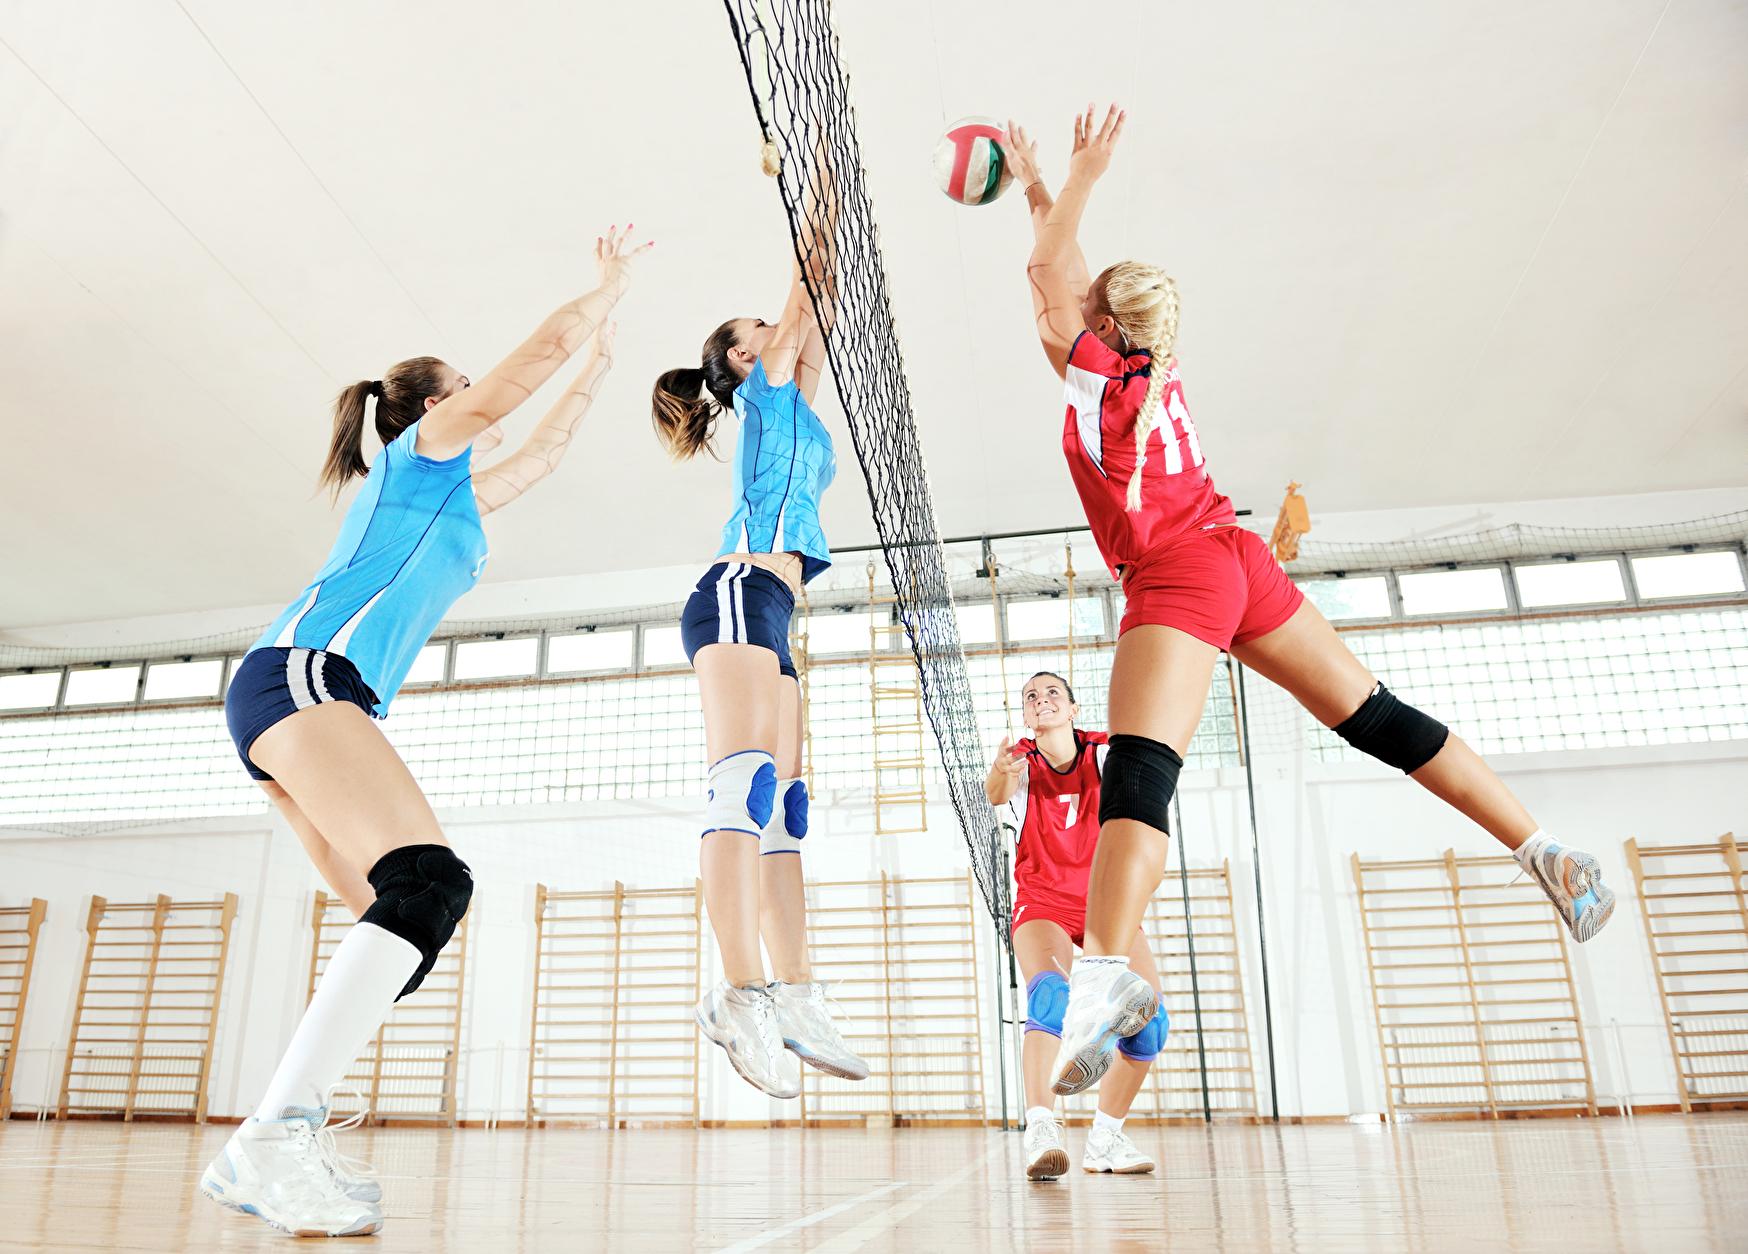 Regler for volleyball - Kroppsøving (vg3) (LK06) - NDLA